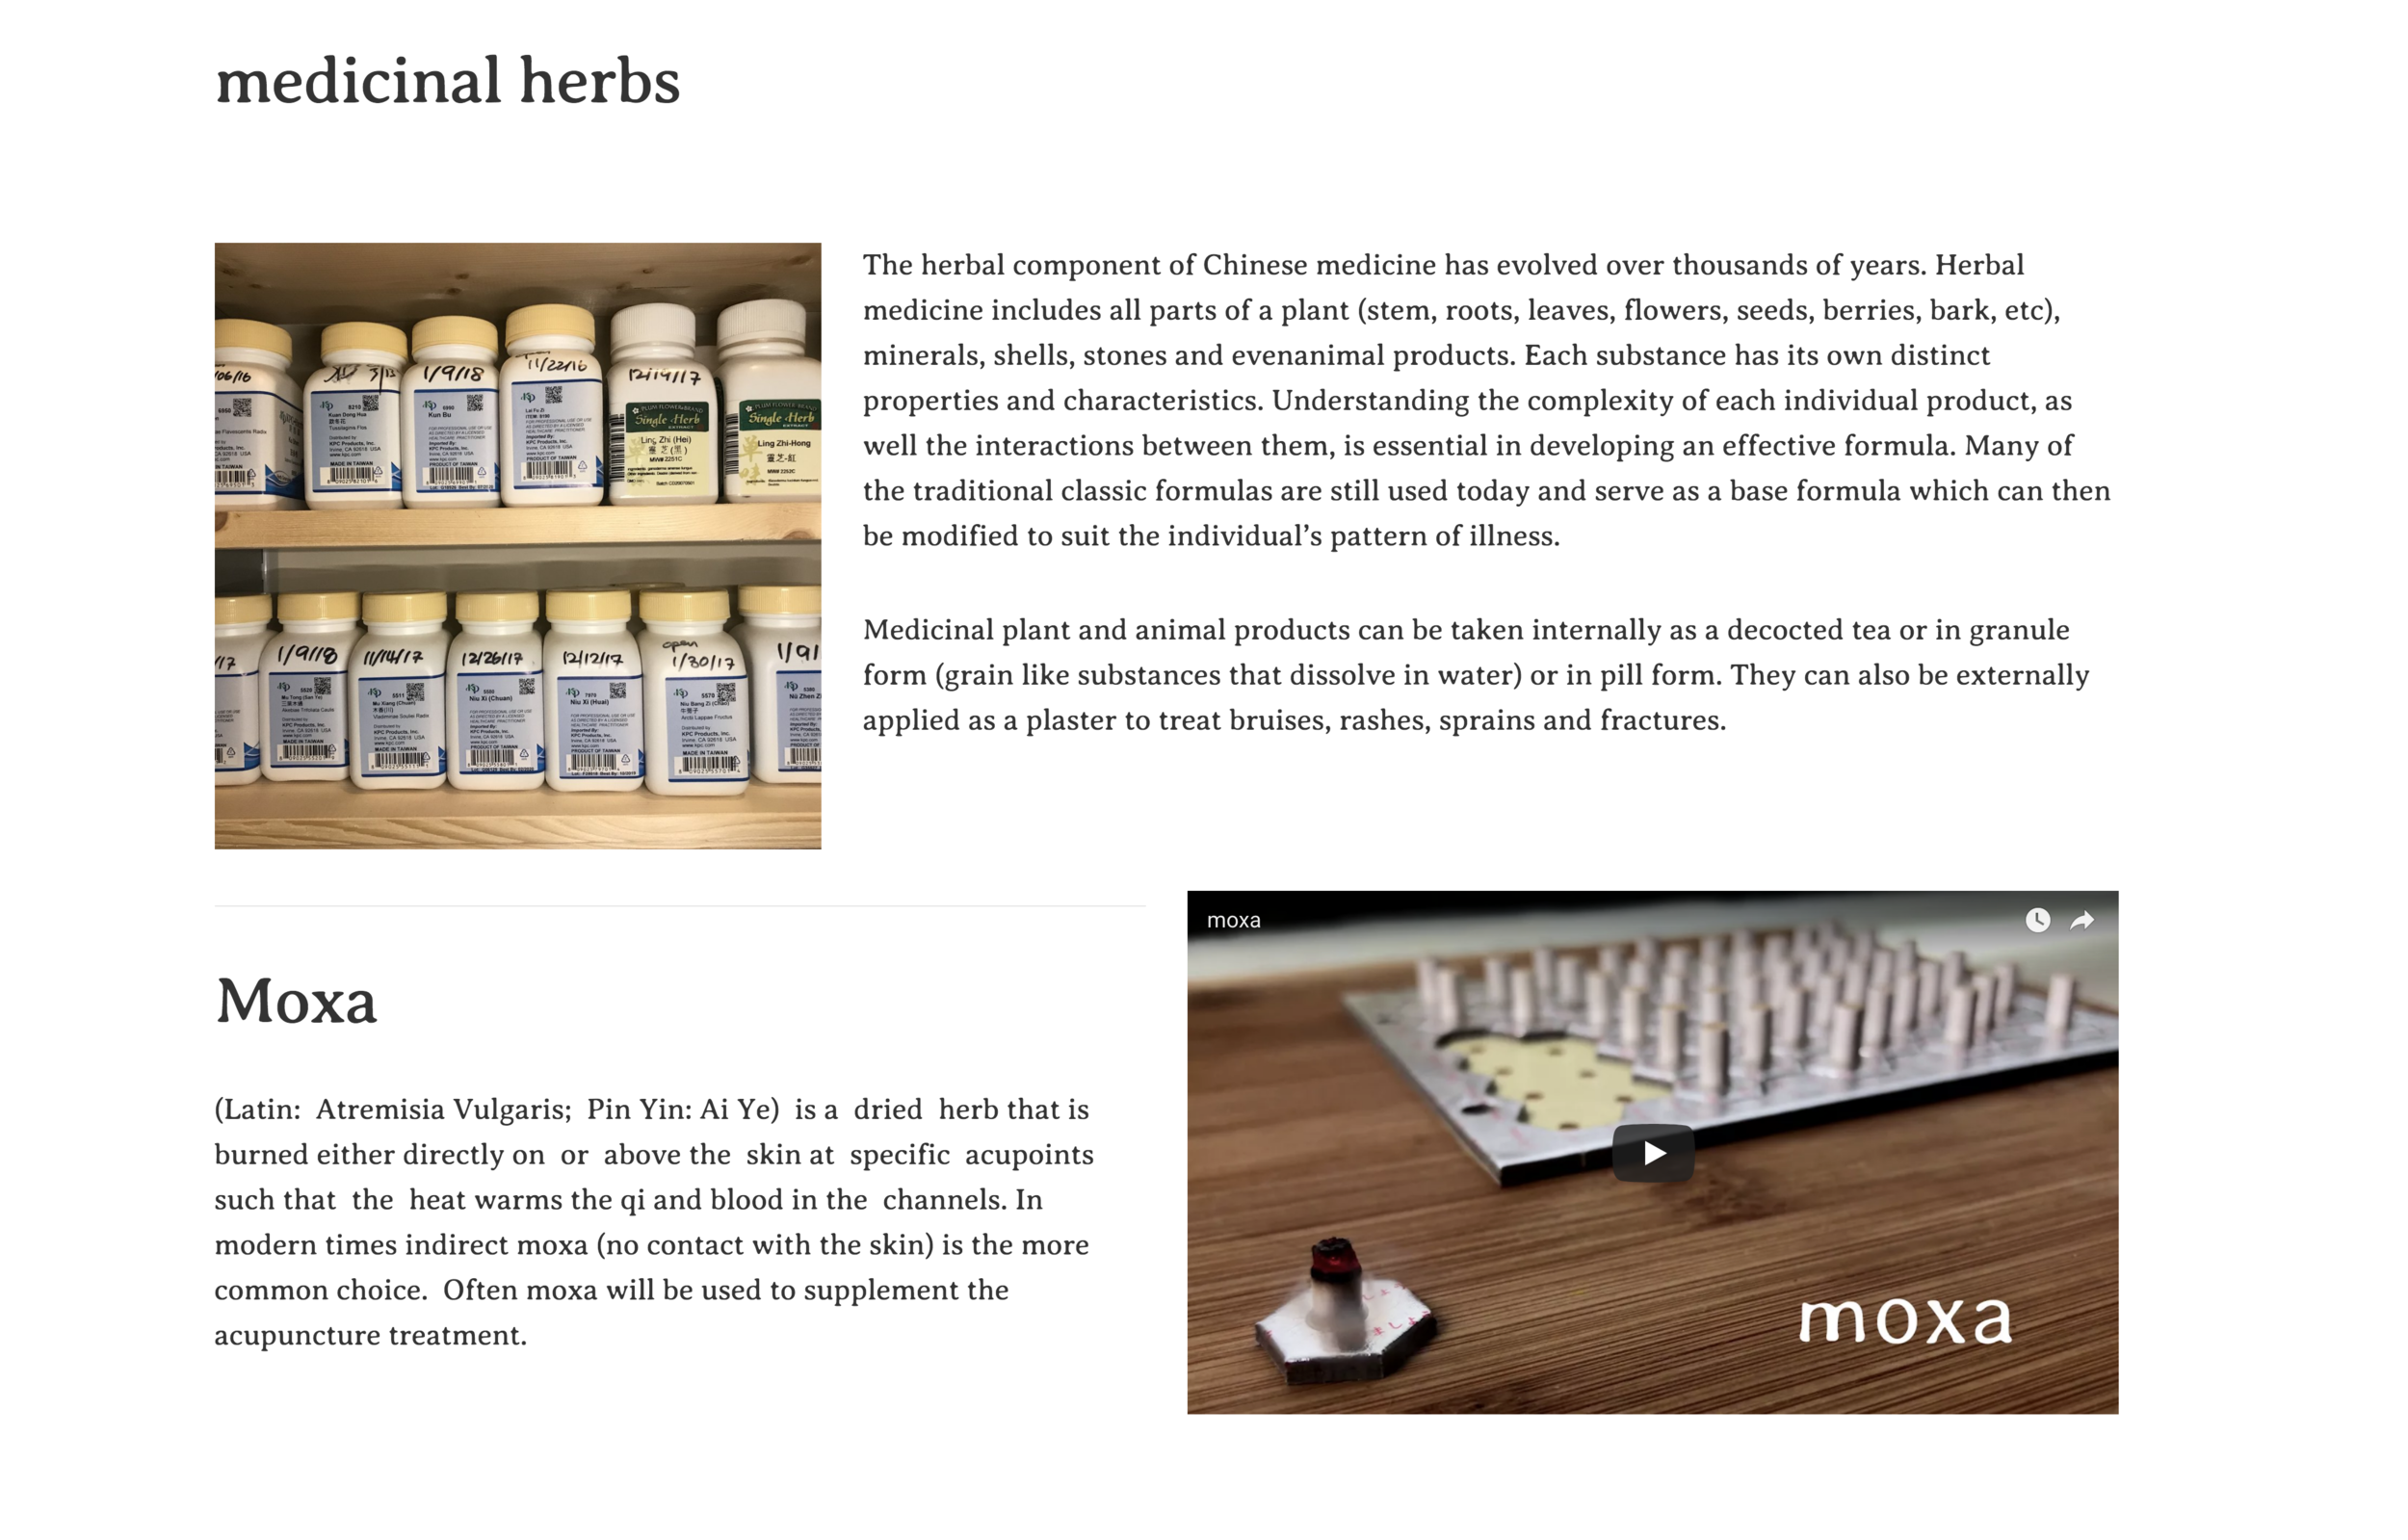 medicinal herbs /moxa